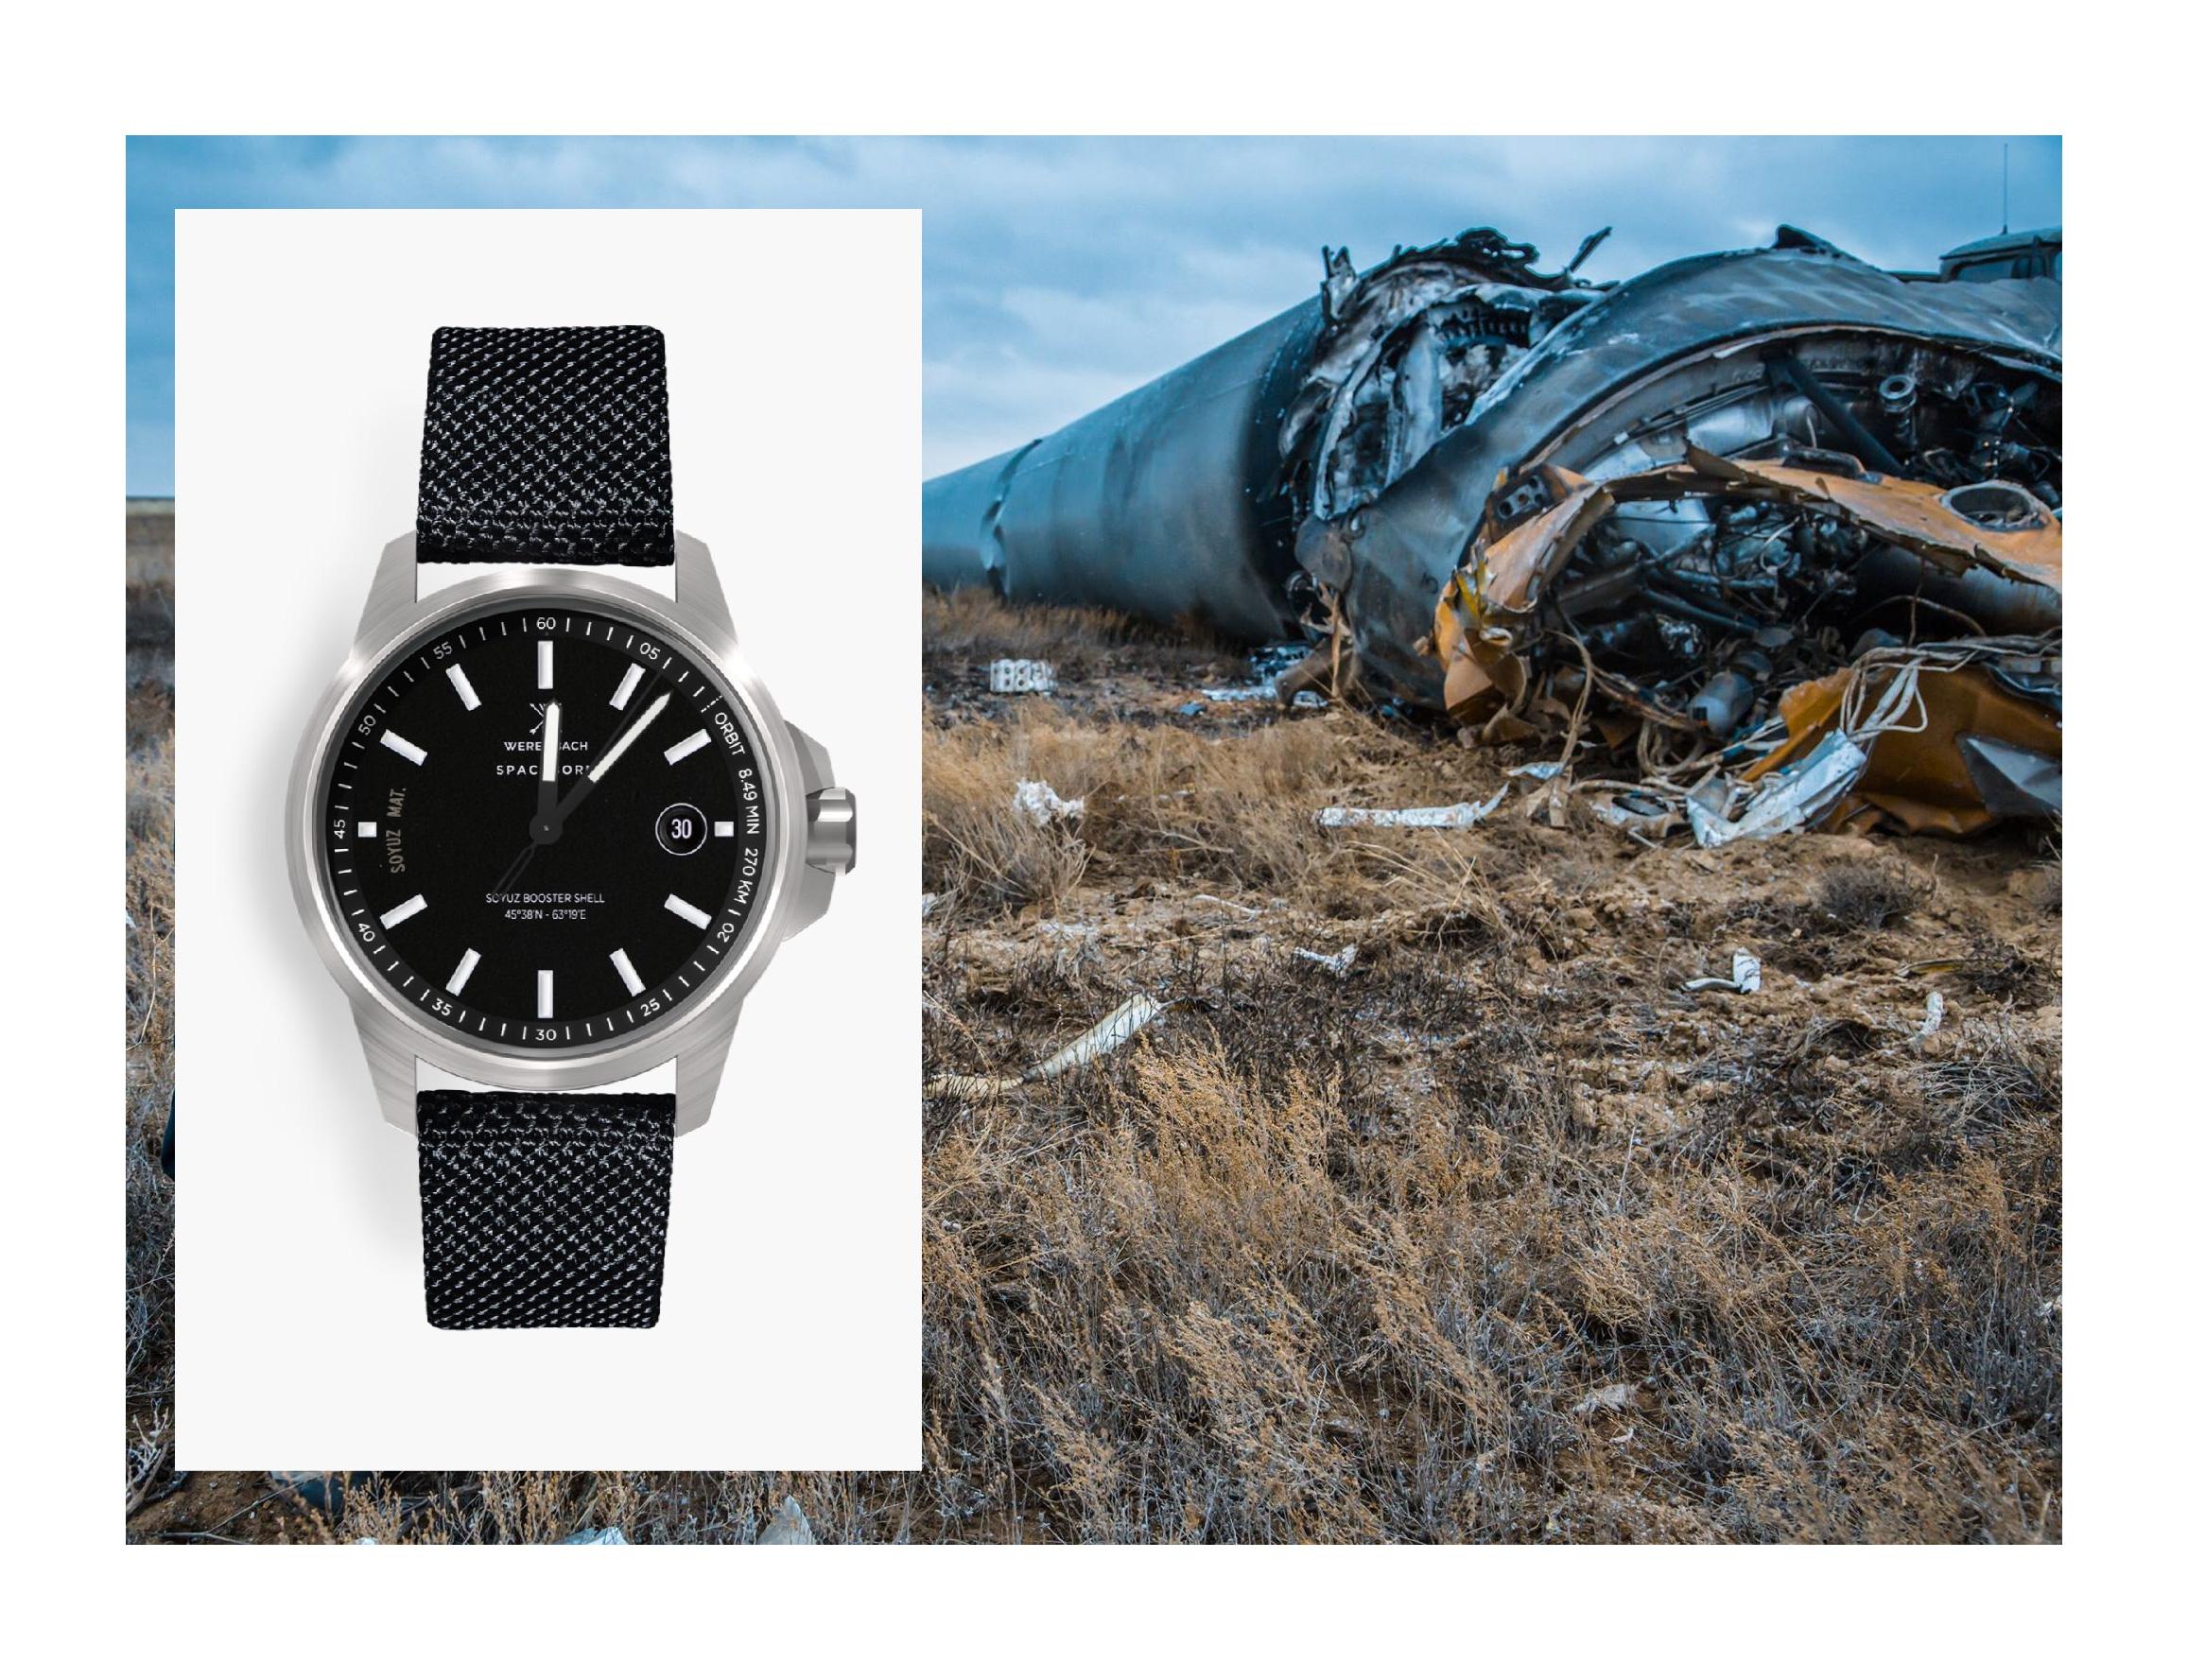 Soyuz Rocket Watch Werenbach